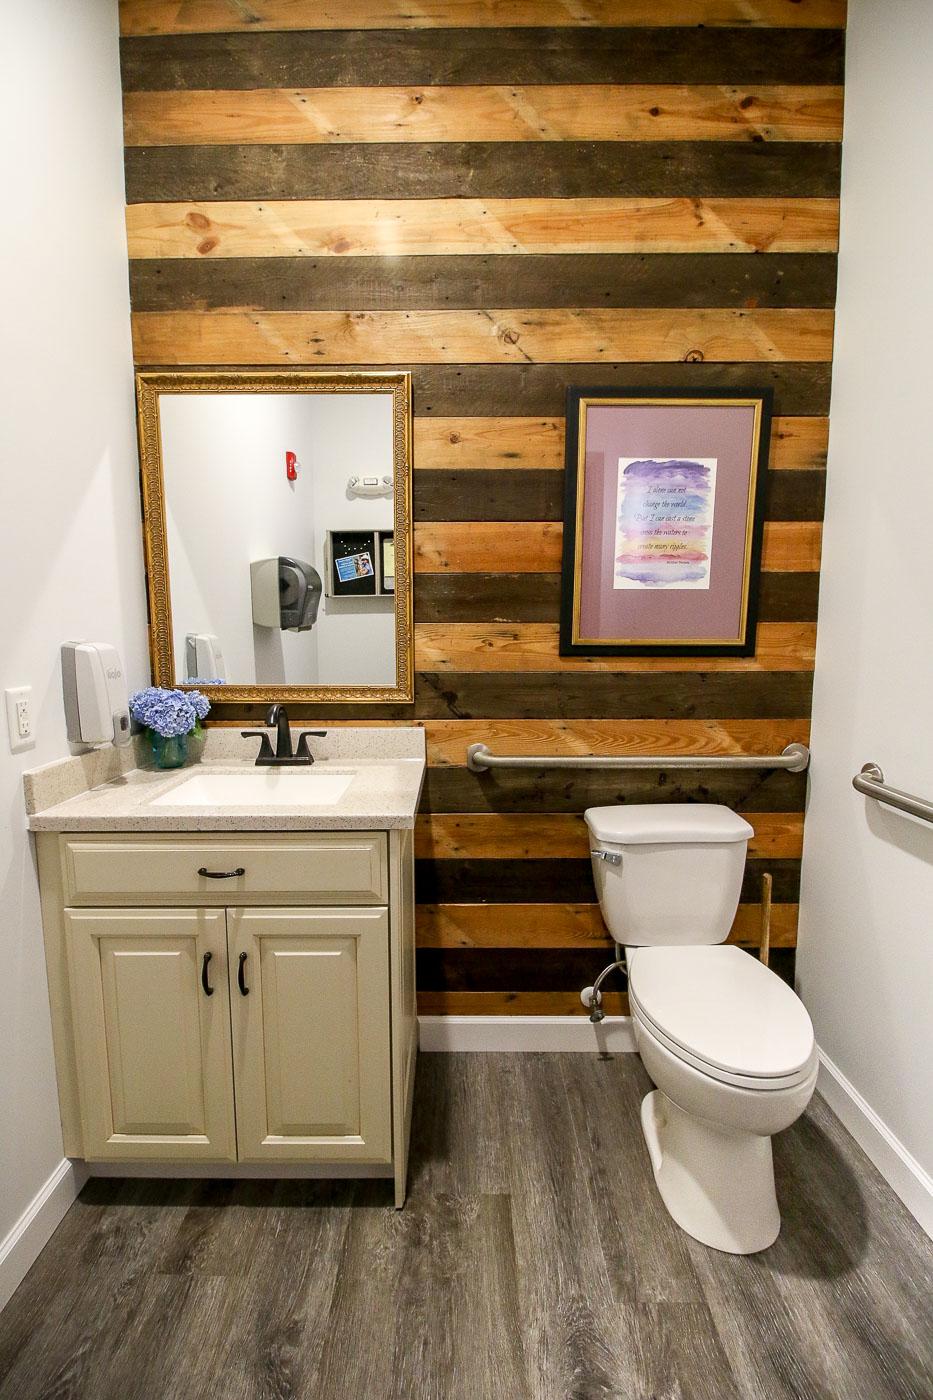 Habitat for Humanity Bathroom Renovations